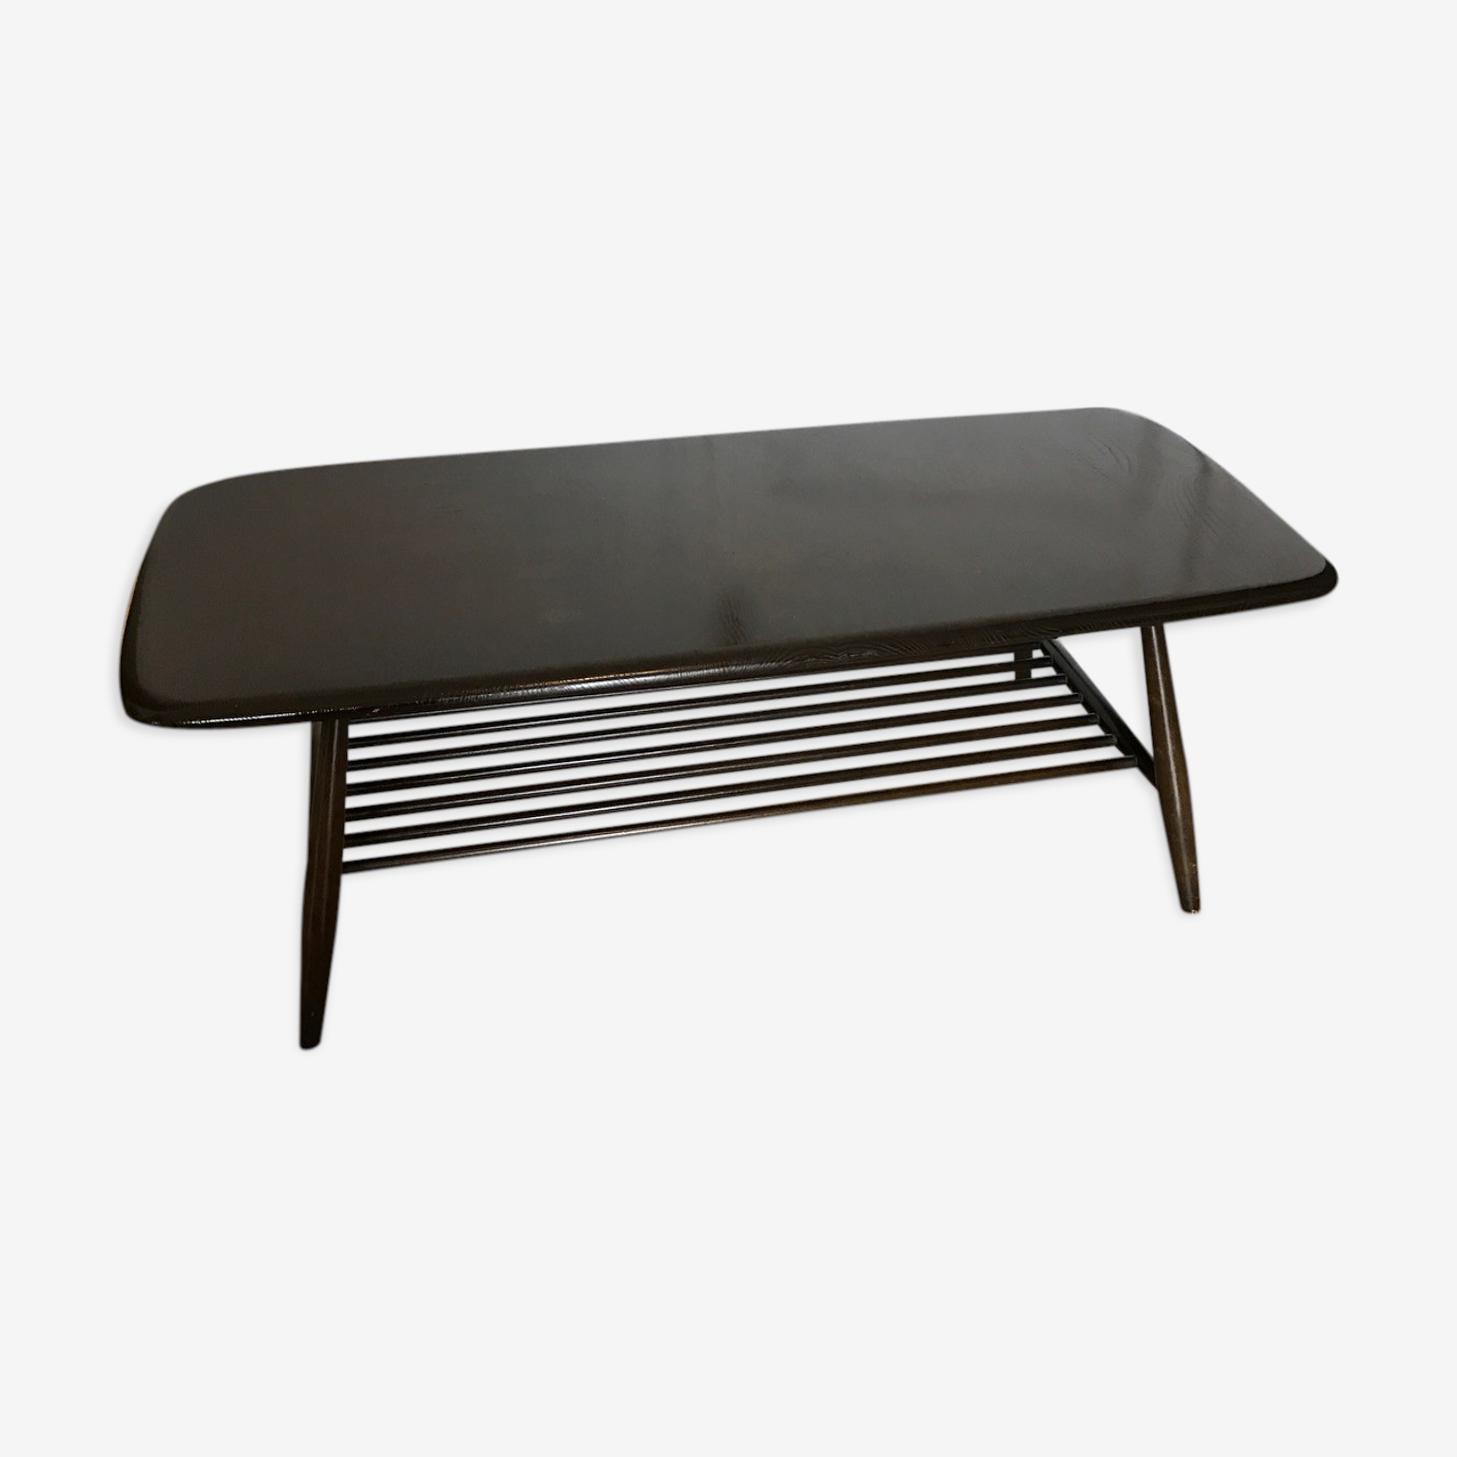 table basse vintage d'occasion